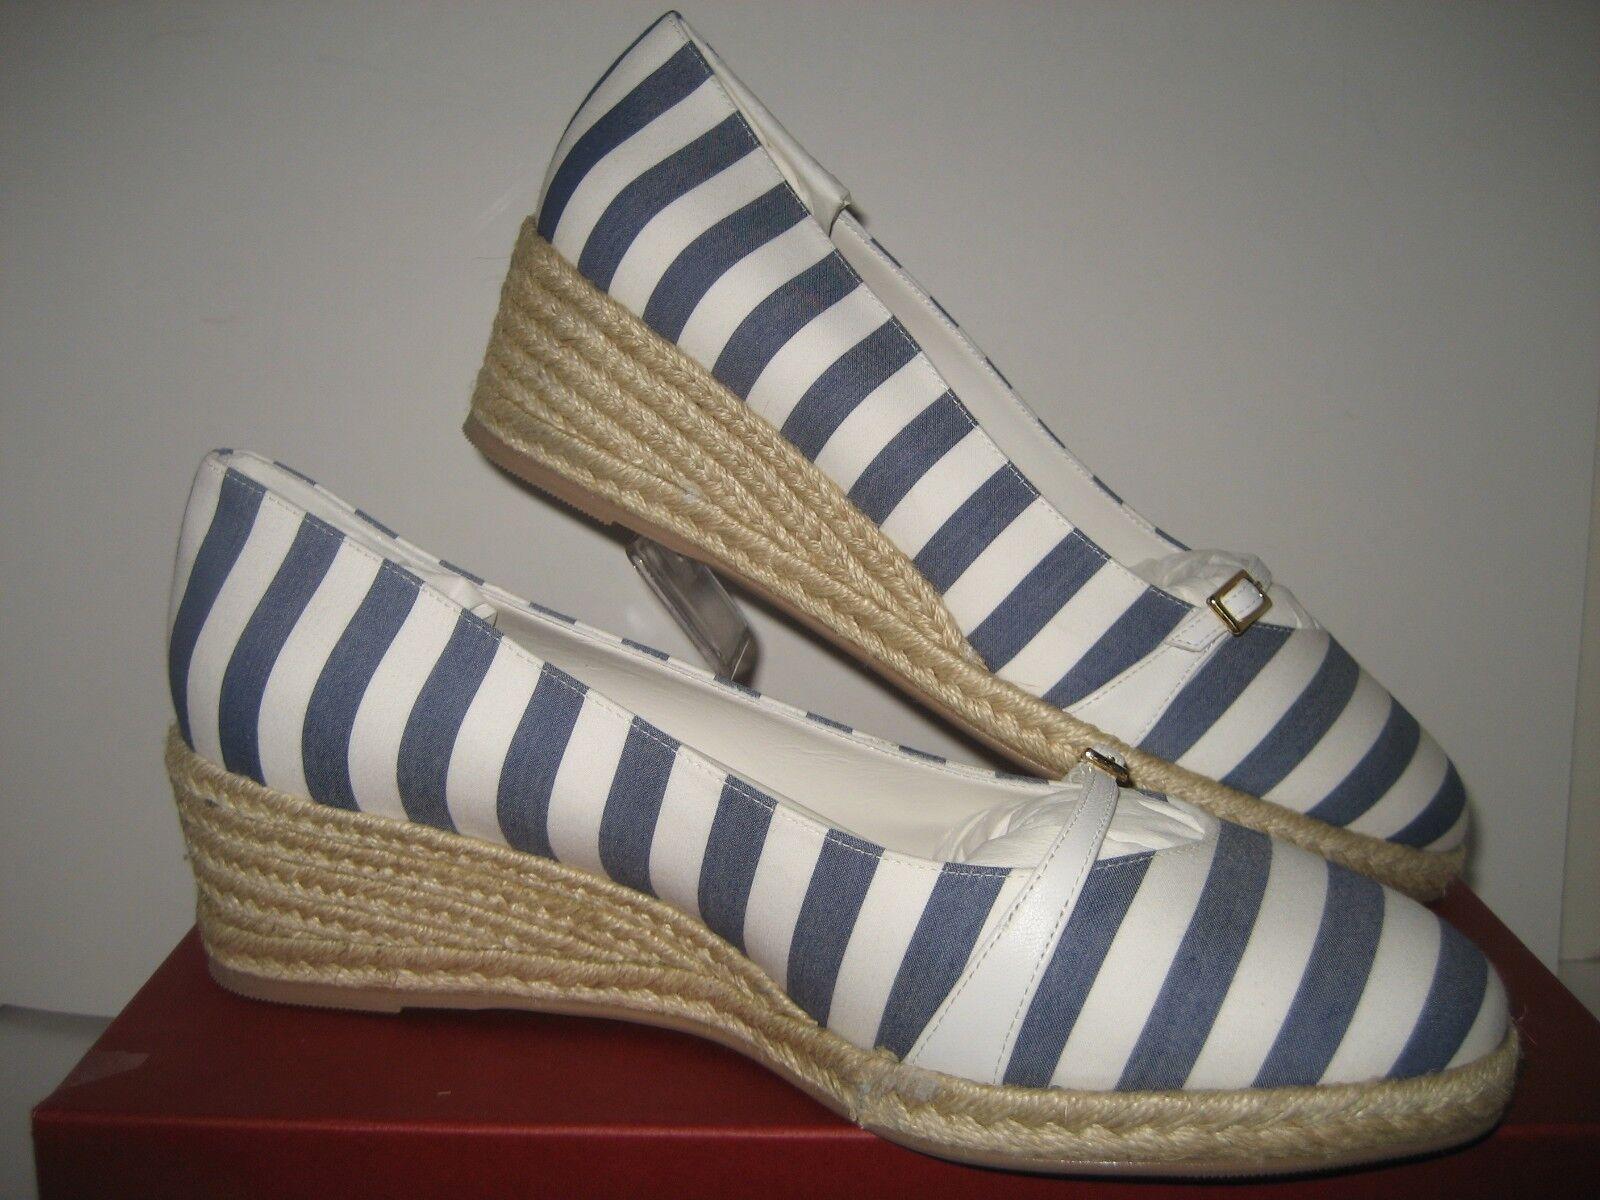 450 NEW NEW NEW Salvatore Ferragamo Audrey bleu blanc Stripes Wedge Heels chaussures US 10.5 88f76d